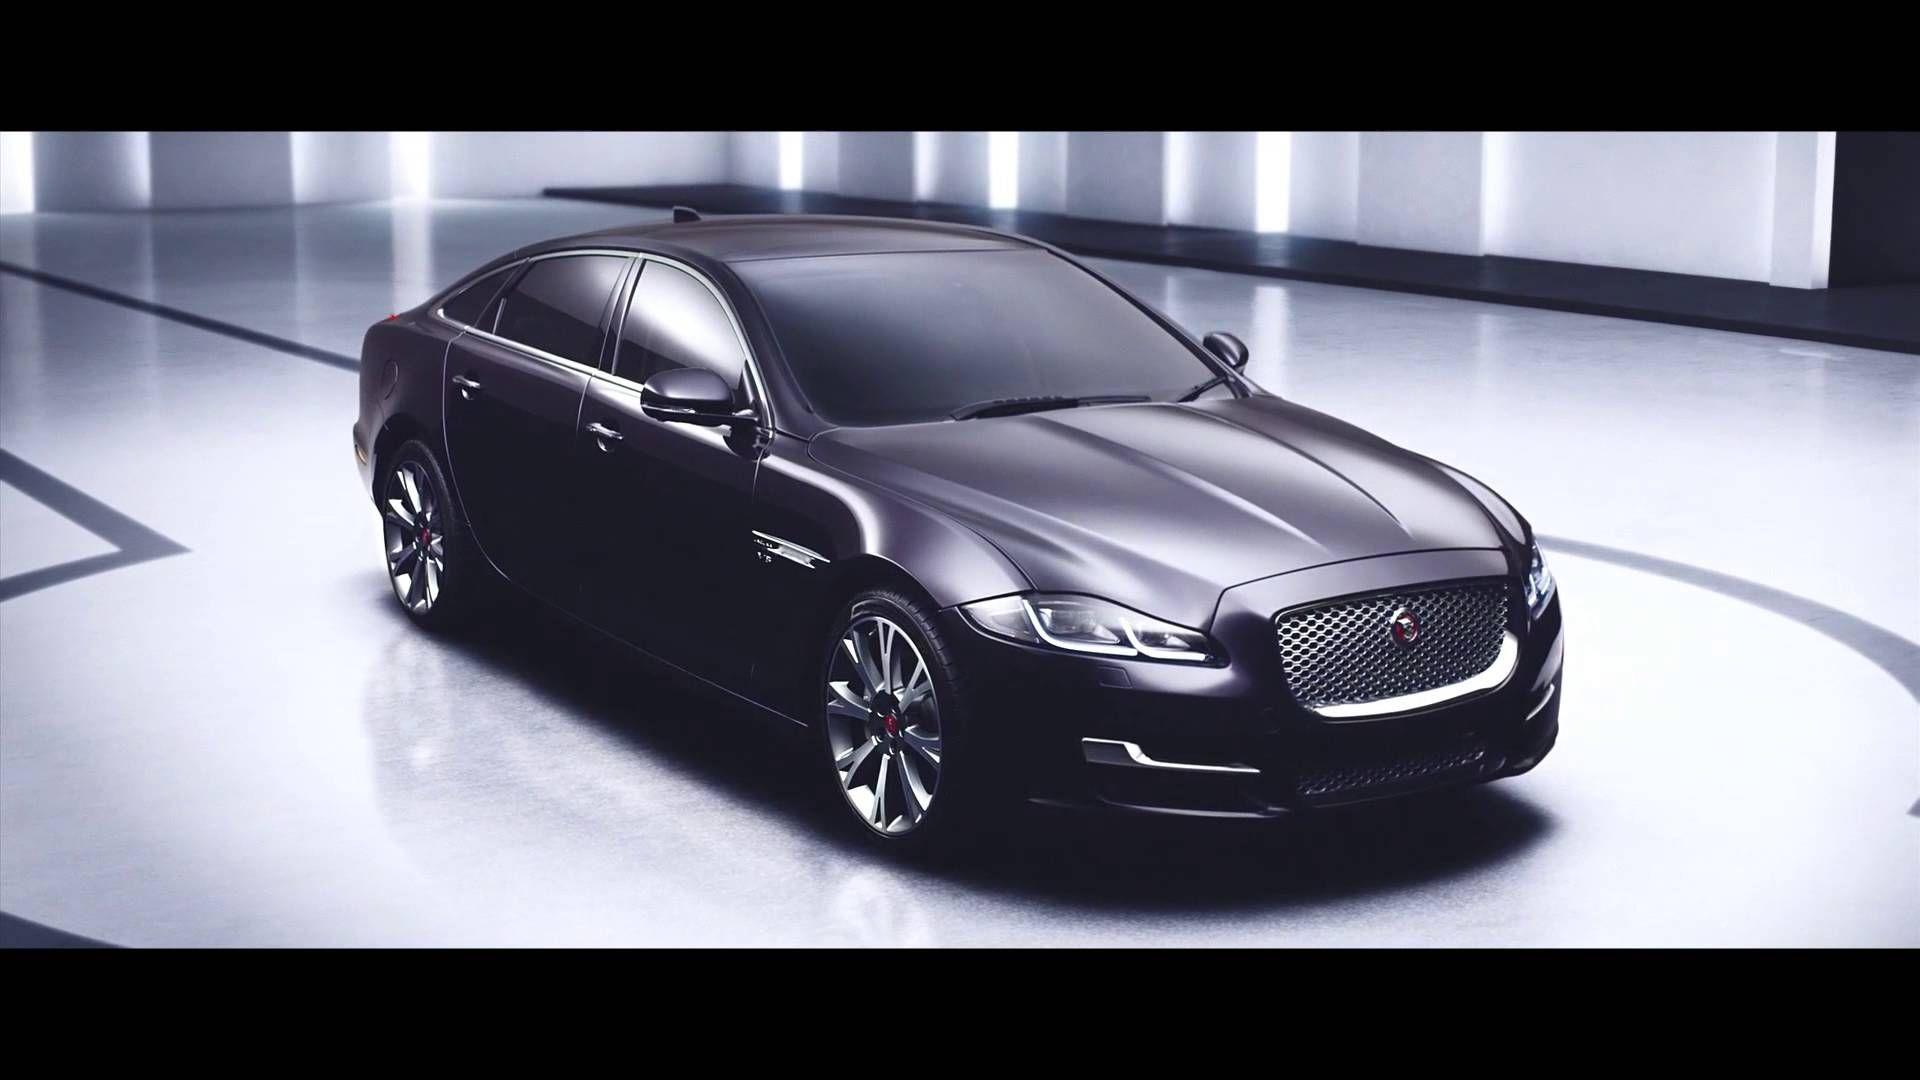 The New Jaguar Xj Is The Biggest And Prestigious Saloon By Jaguar